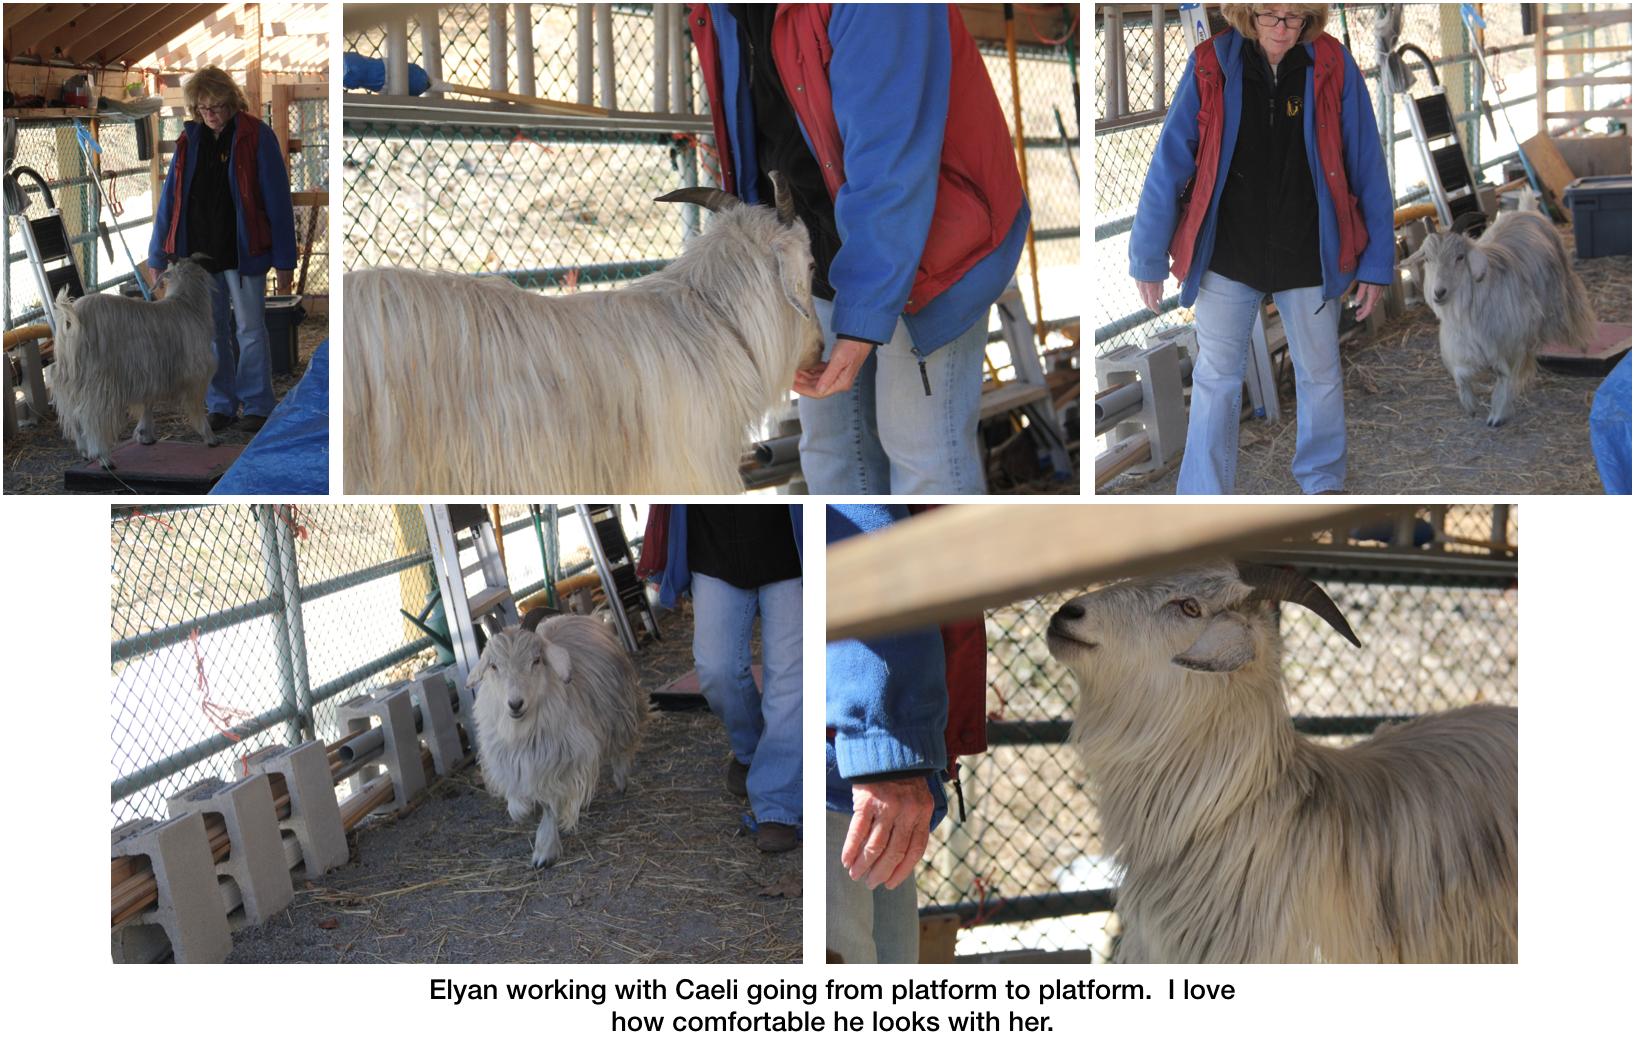 Goats Elyan working with Caeli